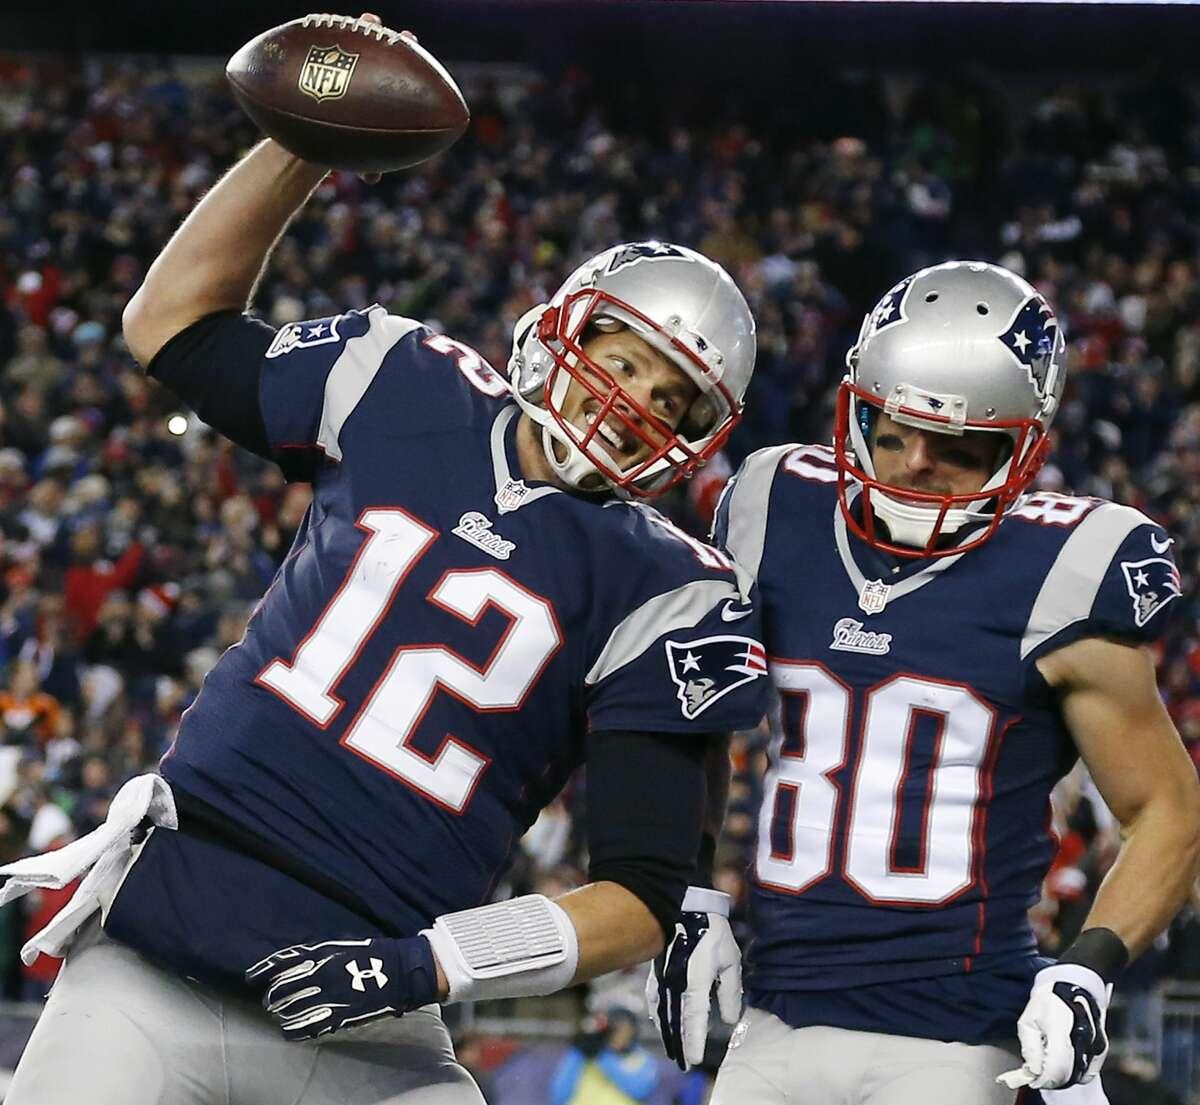 New England Patriots quarterback Tom Brady (12) celebrates with receiver Danny Amendola (80) in the first half of their Nov. 2 win over the Denver Broncos in Foxborough, Mass.